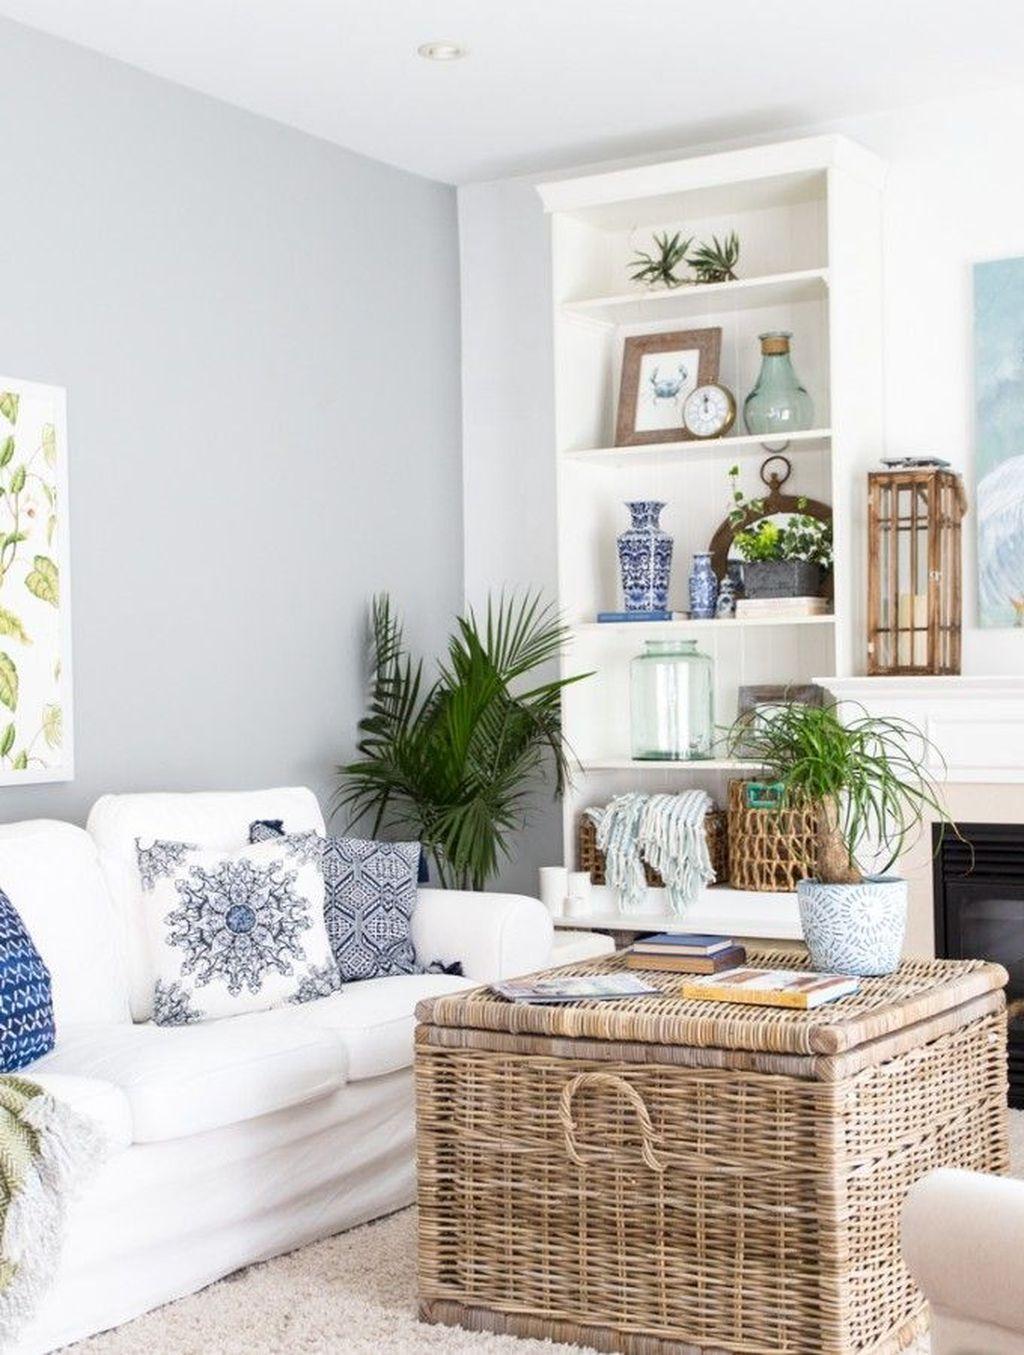 35 Awesome Coastal Living Room Decor Ideas images